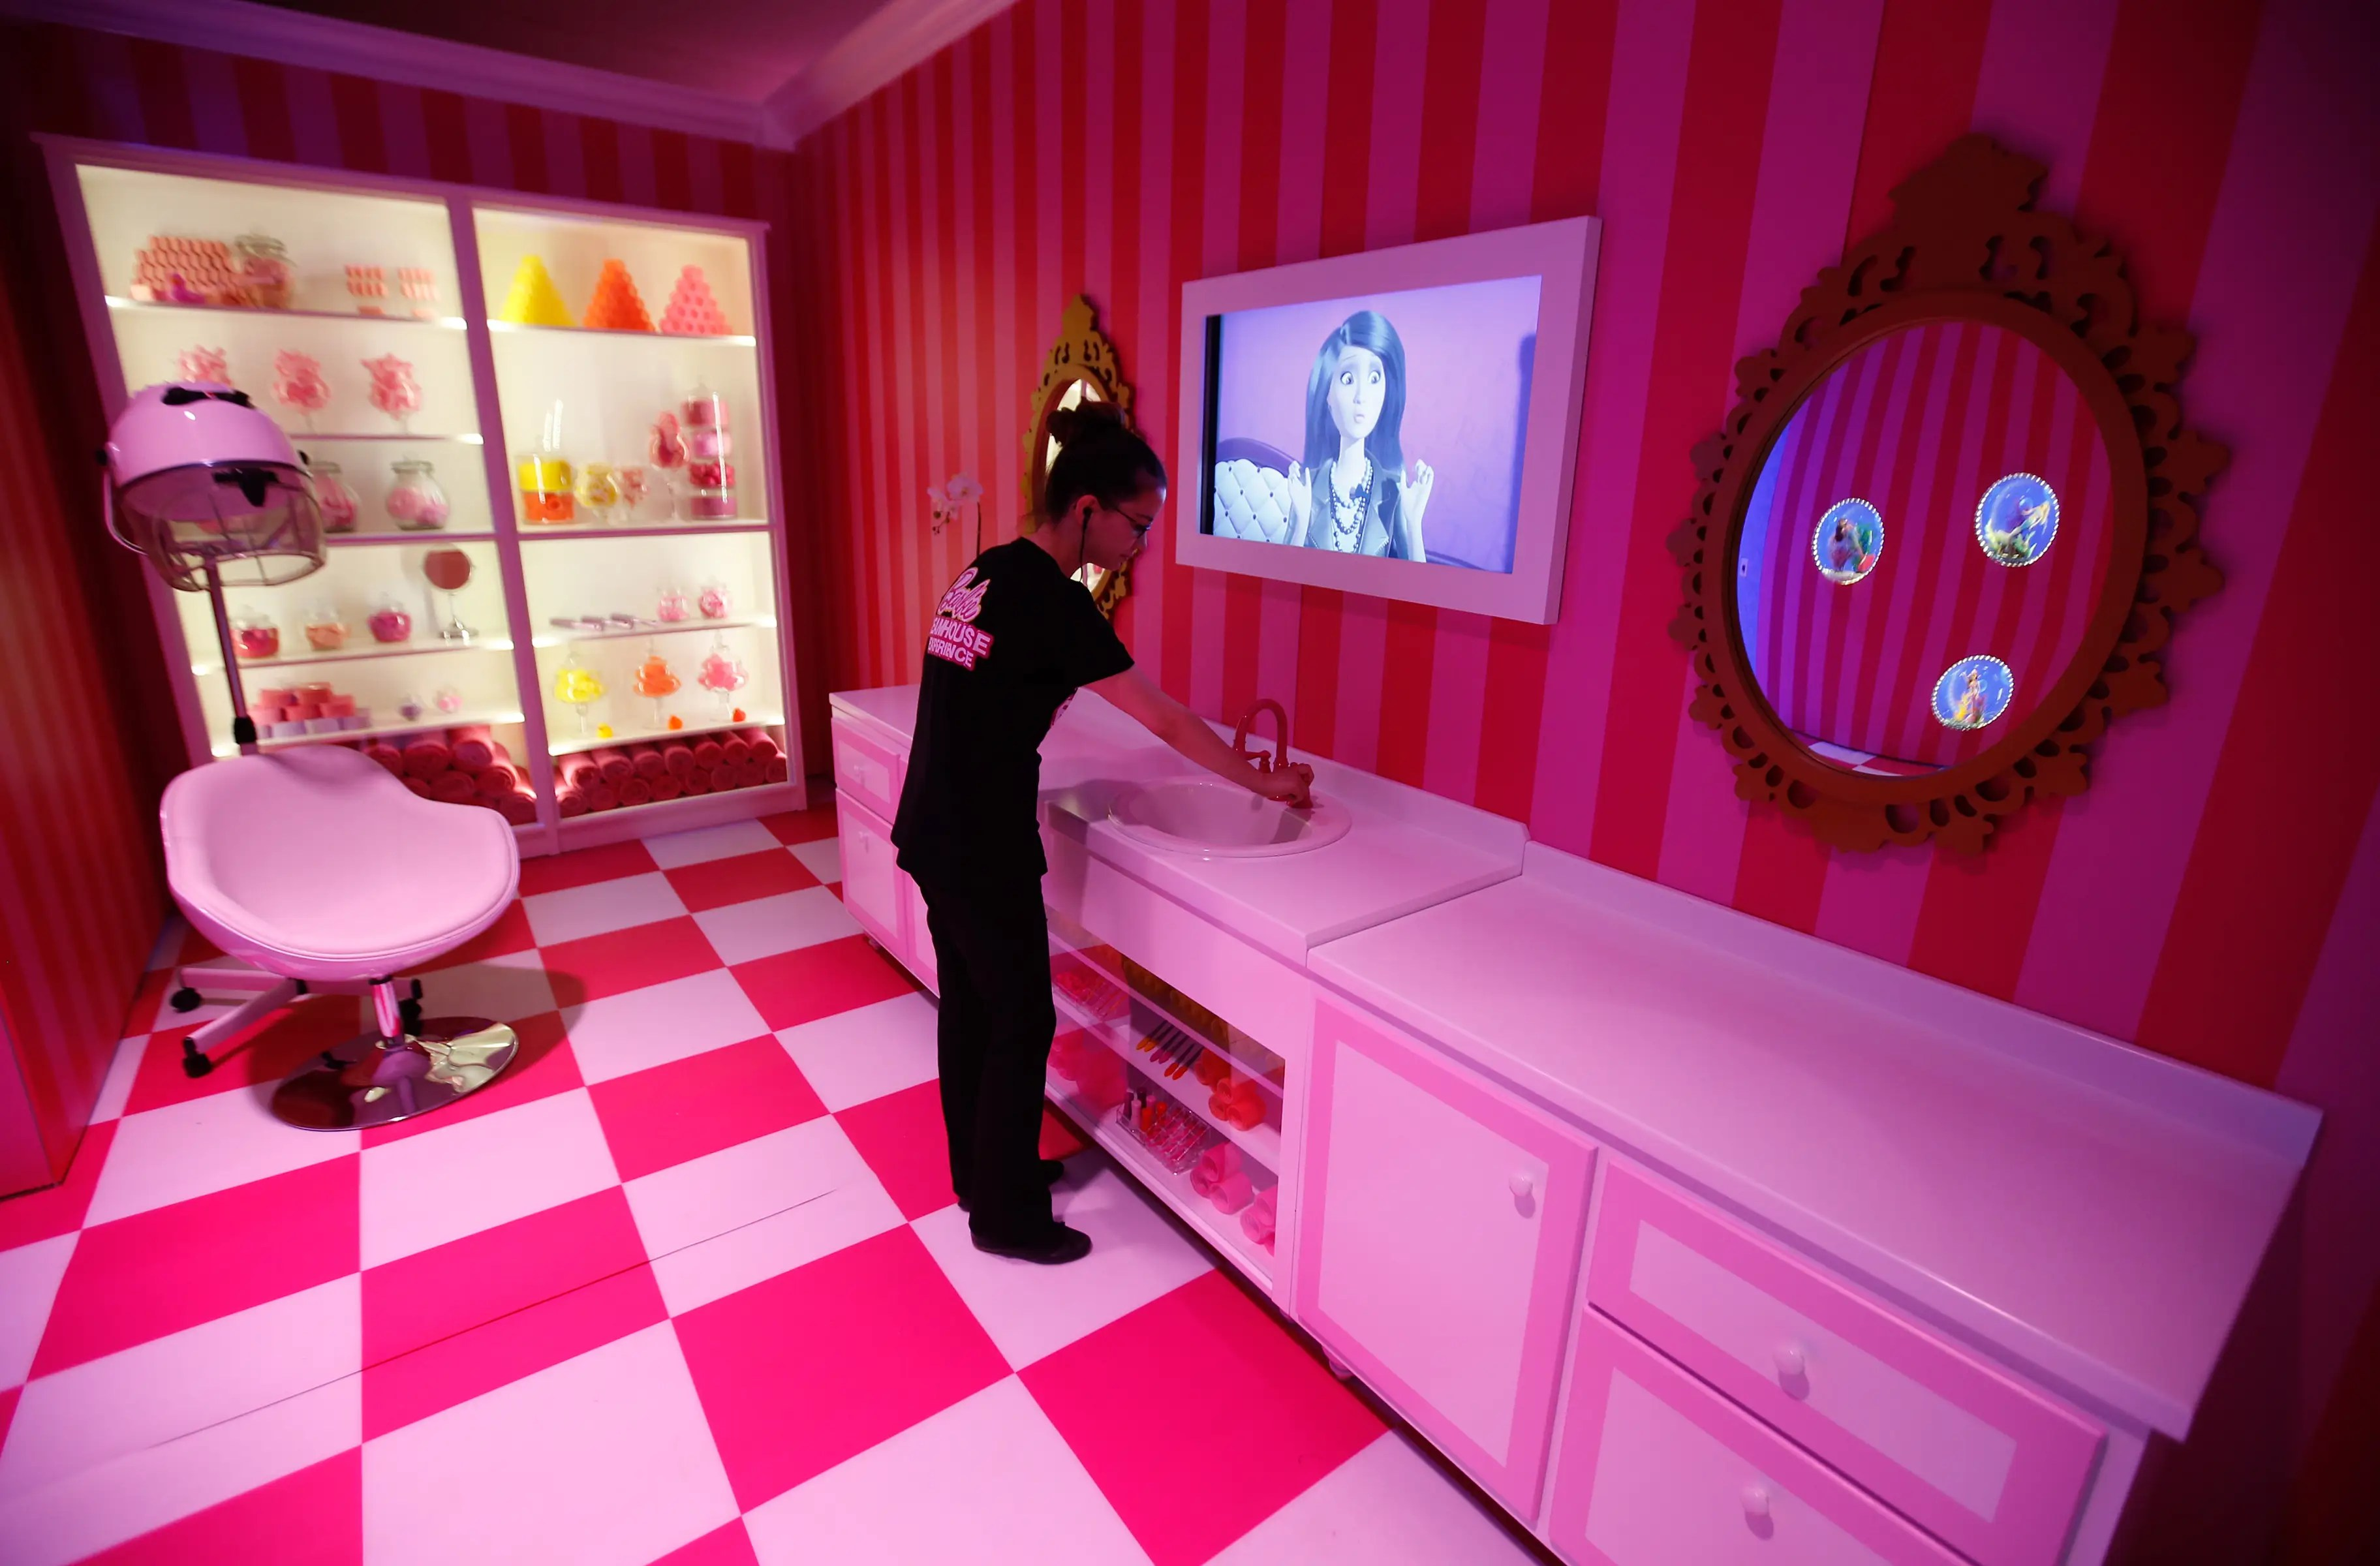 Vasca Da Bagno Barbie : Lotto barbie cucina con bambola armadio vasca da bagno